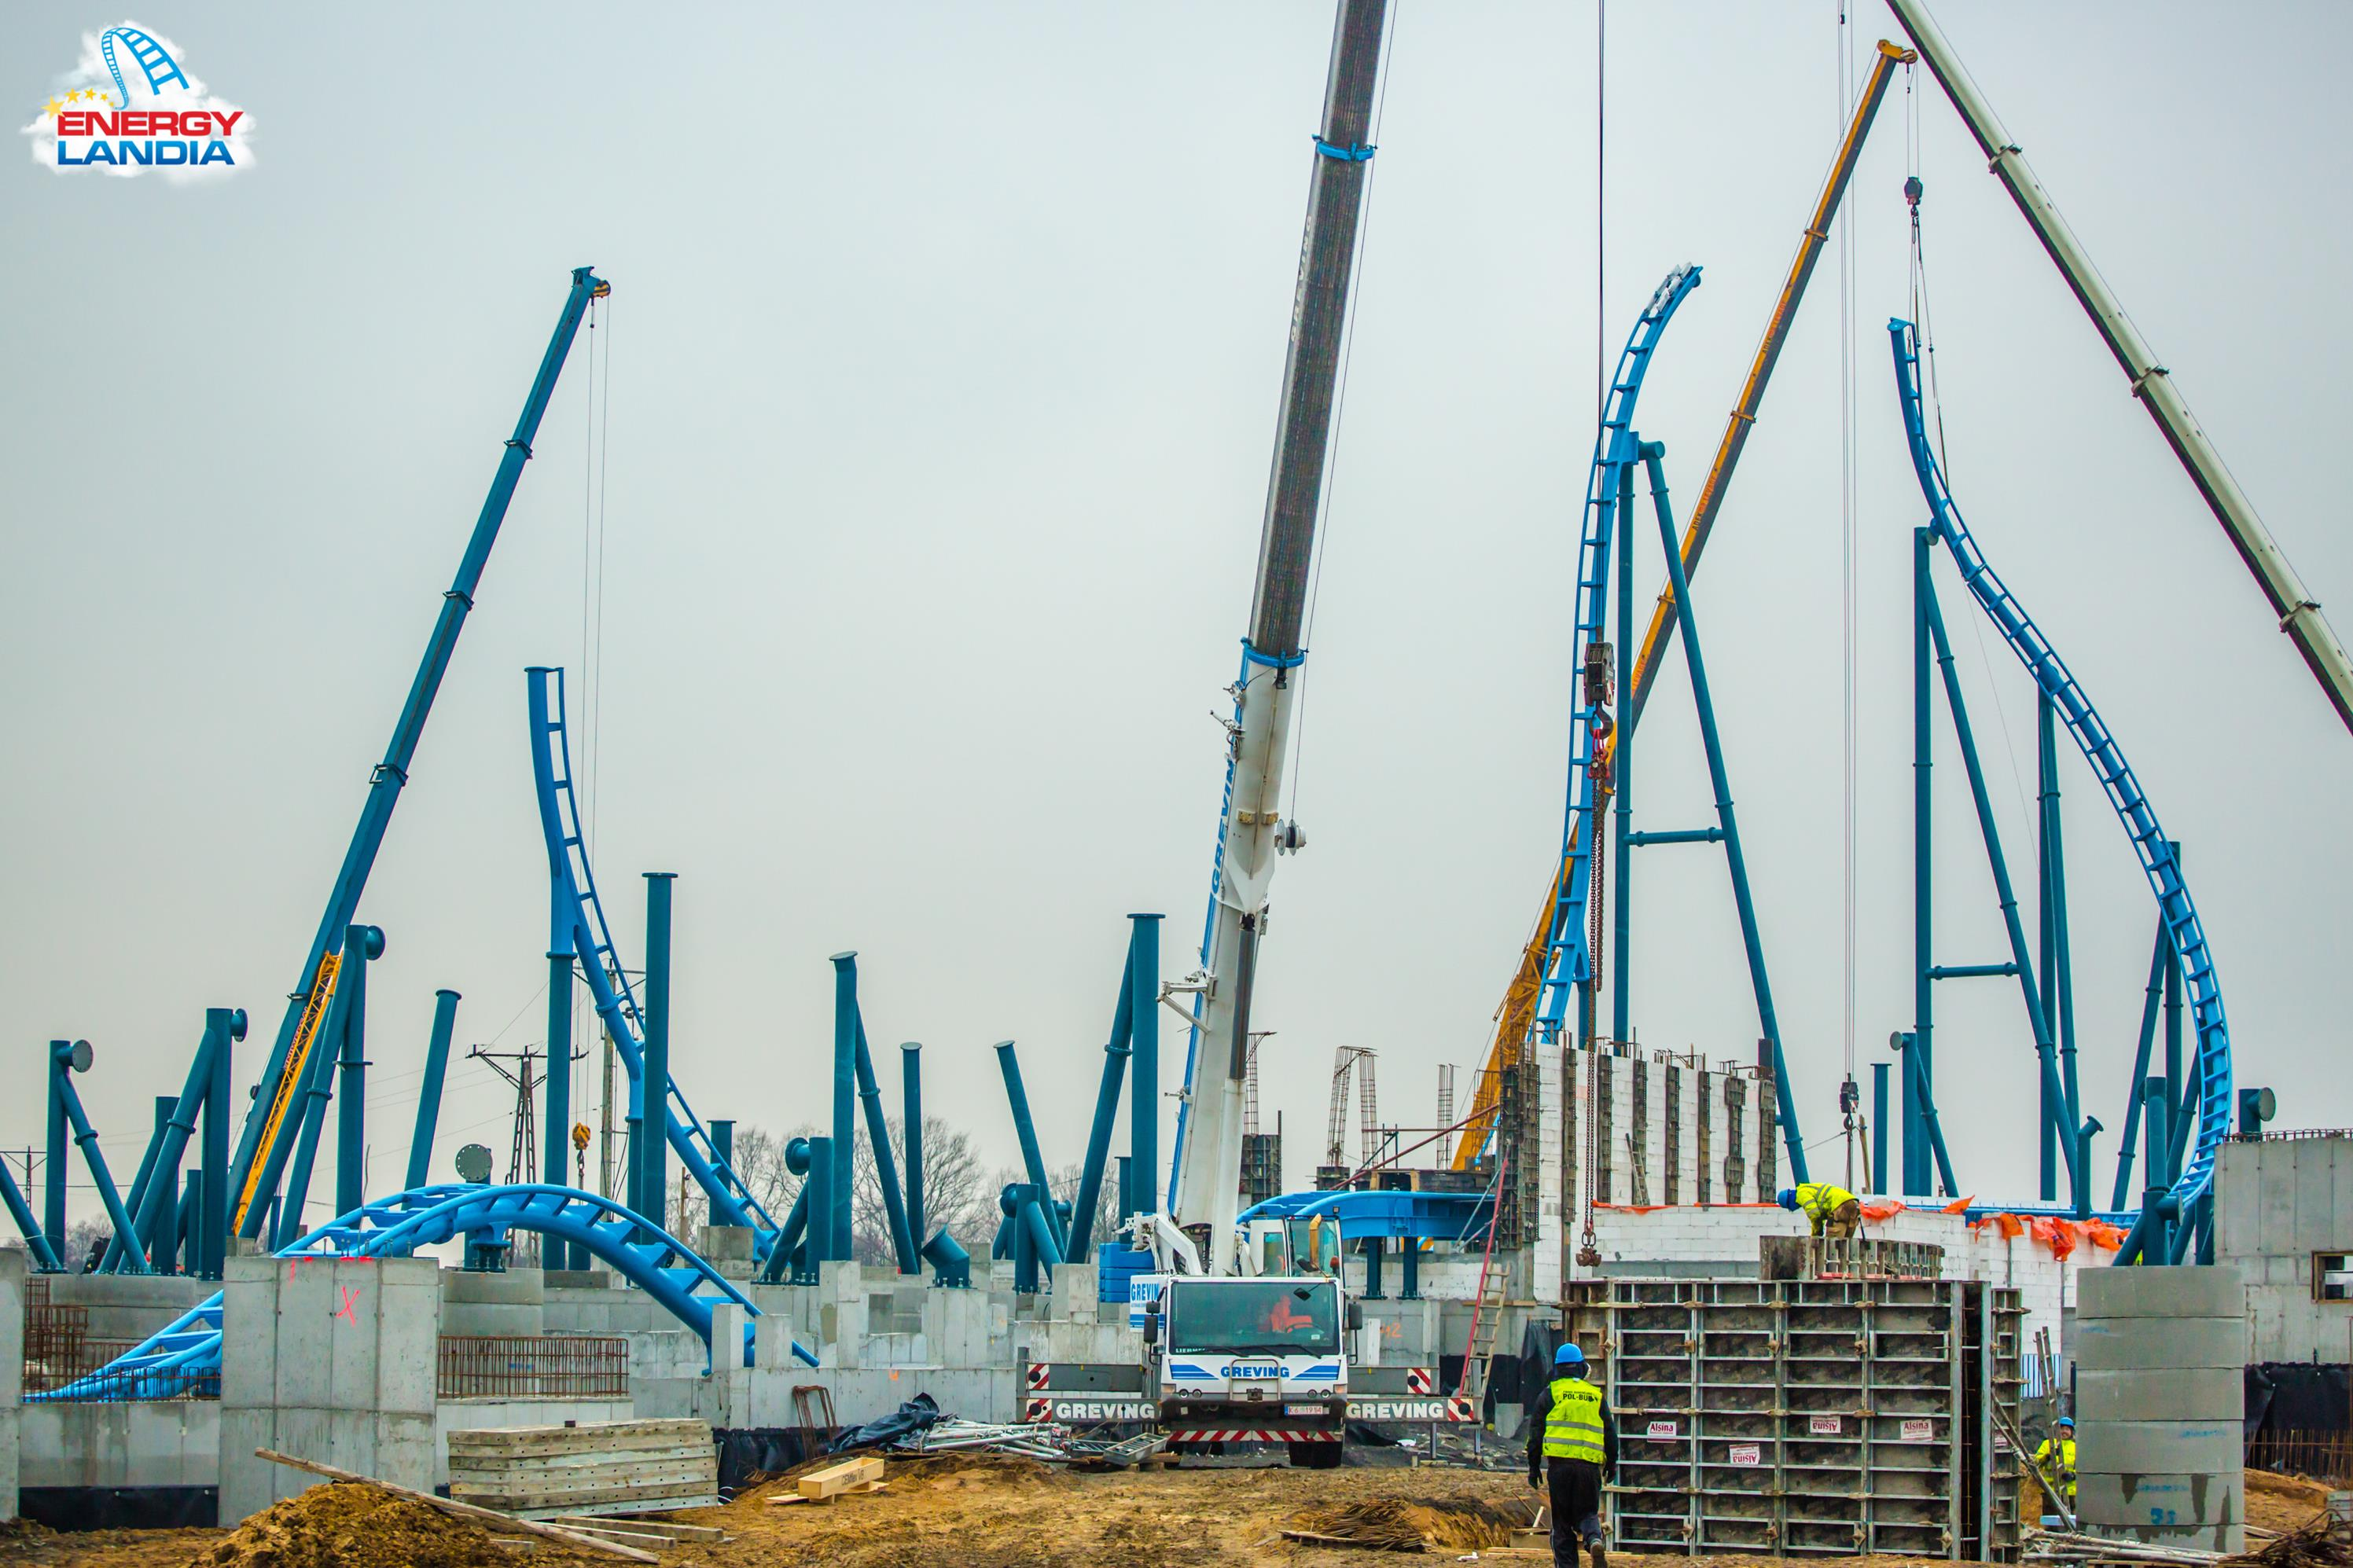 Abyssus - nowy roller coaster w Energylandii